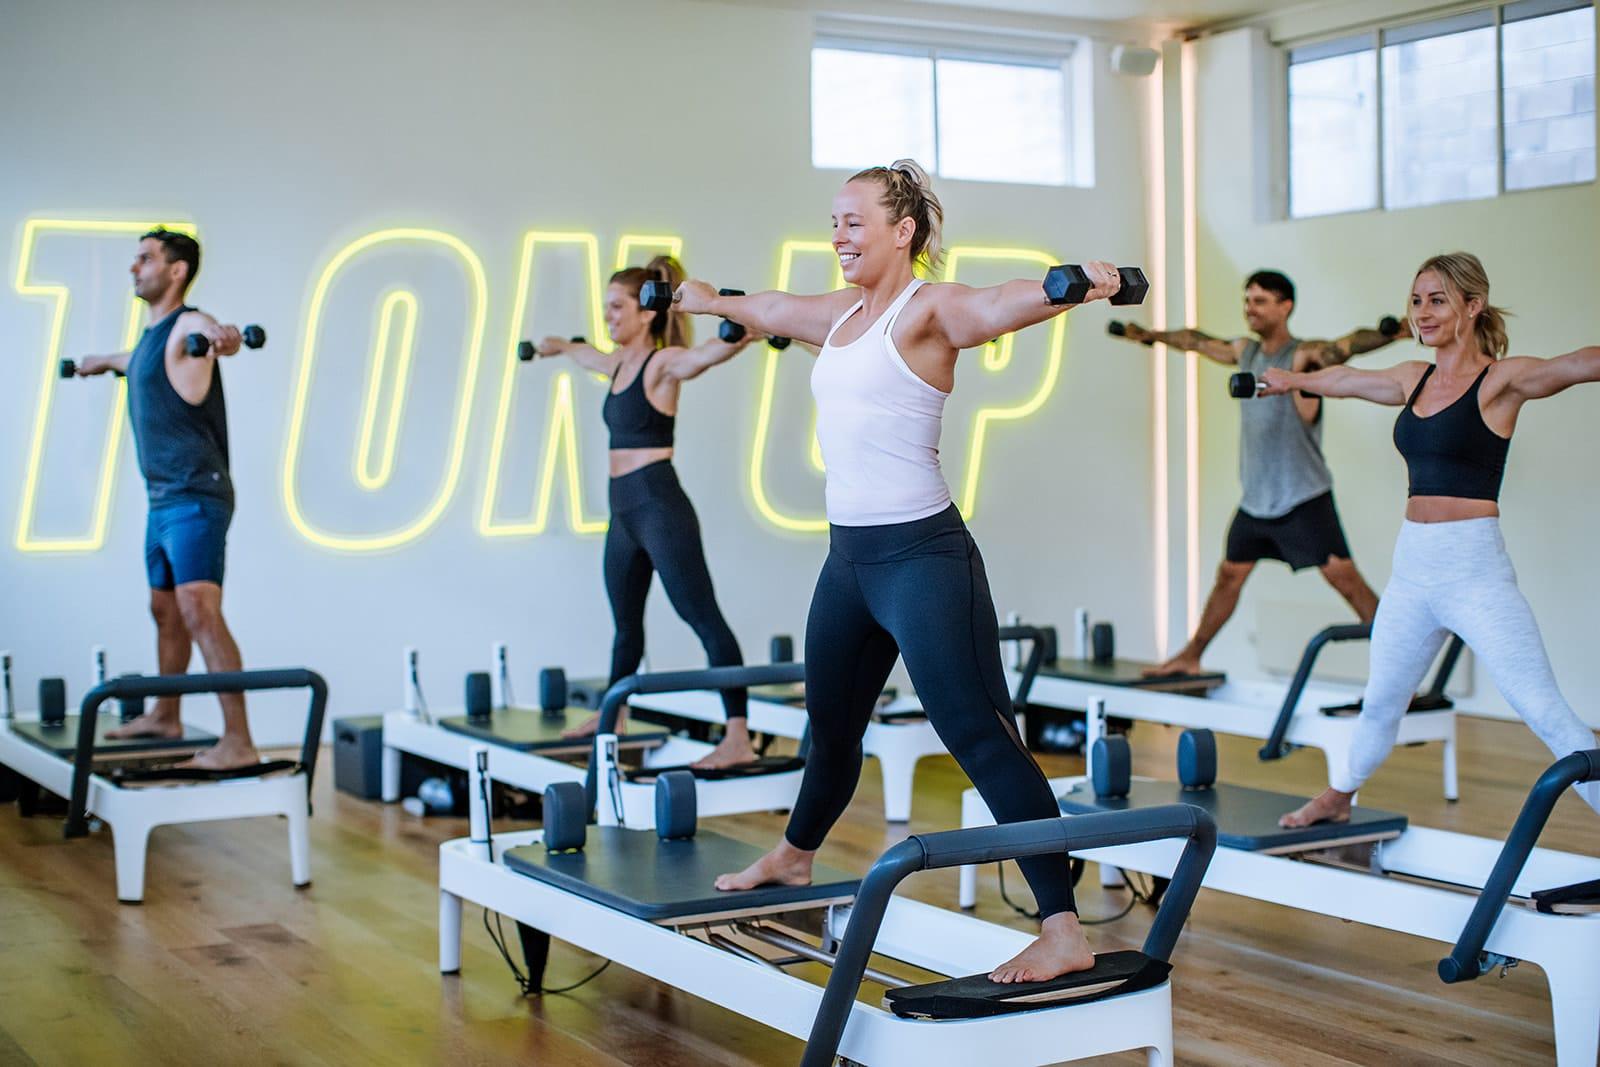 Benefits of Reformer Pilates